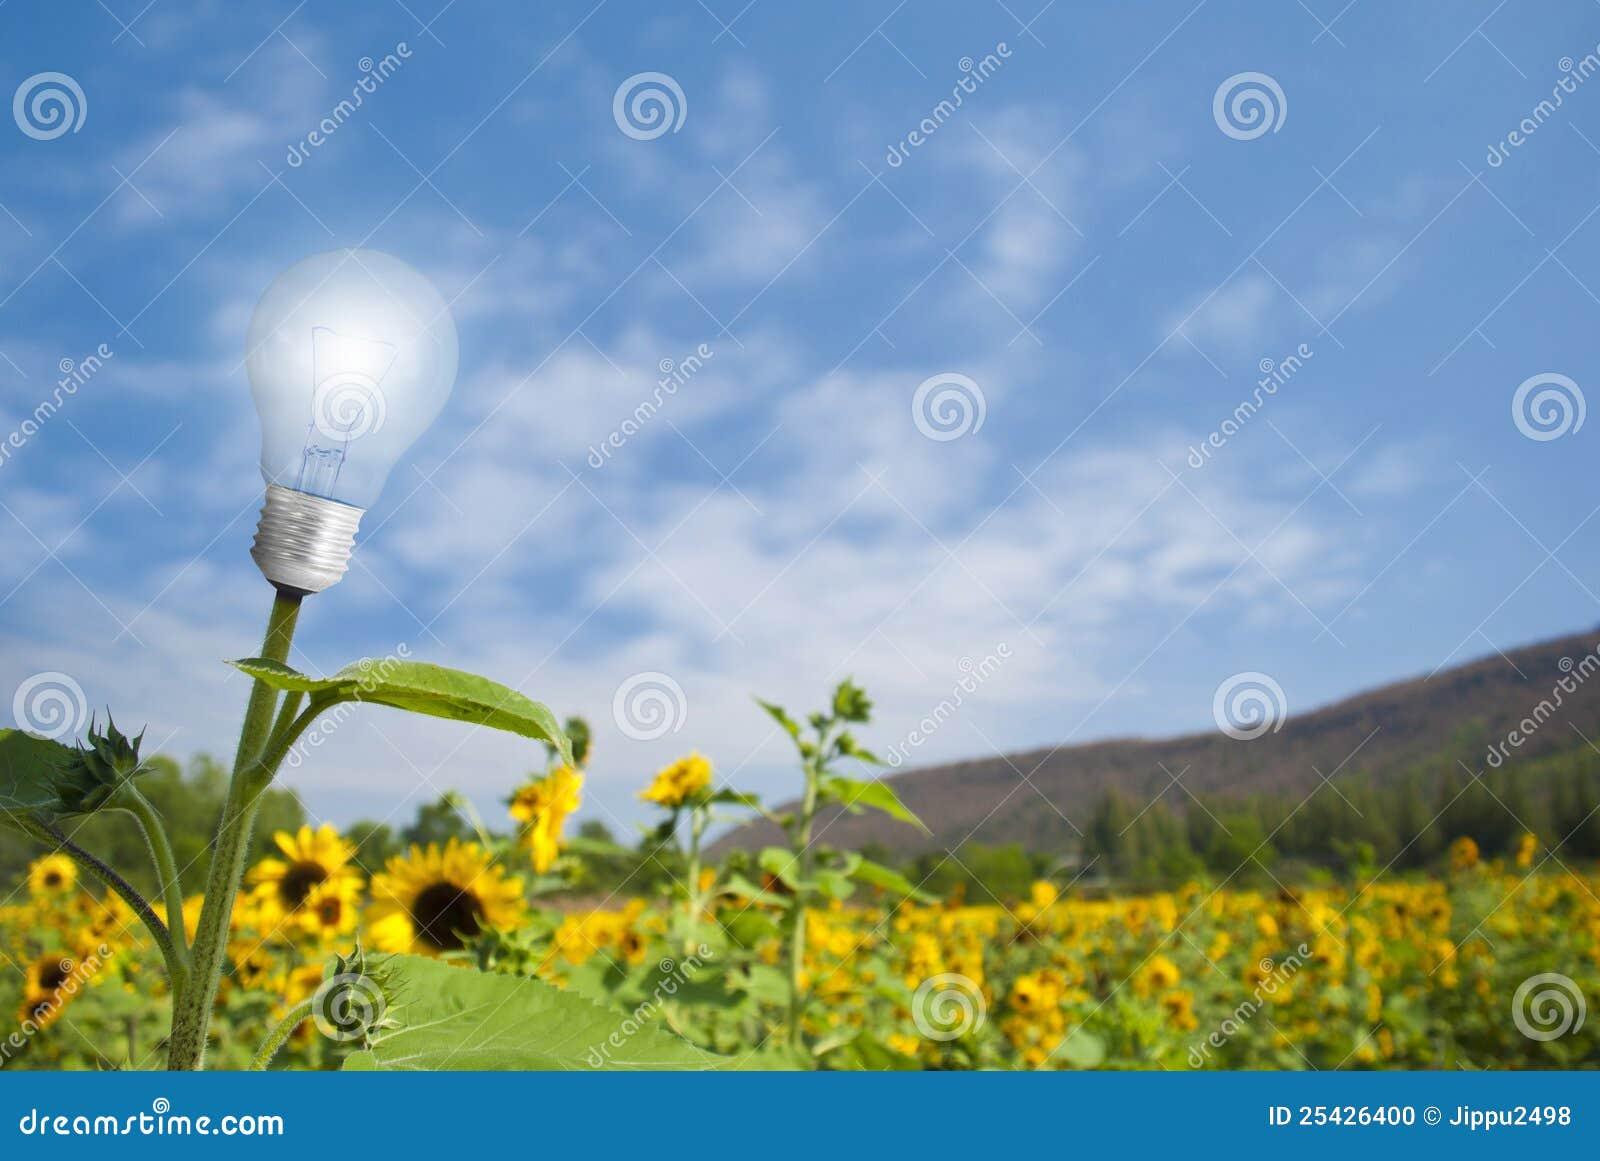 Lamp bulb sunflower on sunflower field